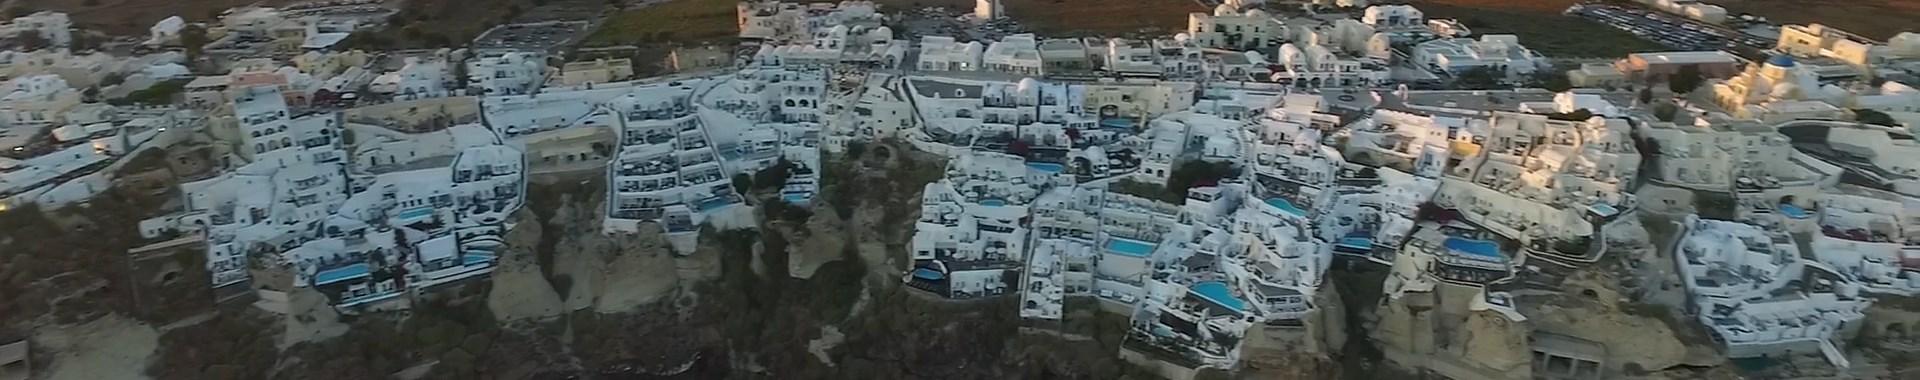 Oia Oia Hotels in Santorini island, Greece